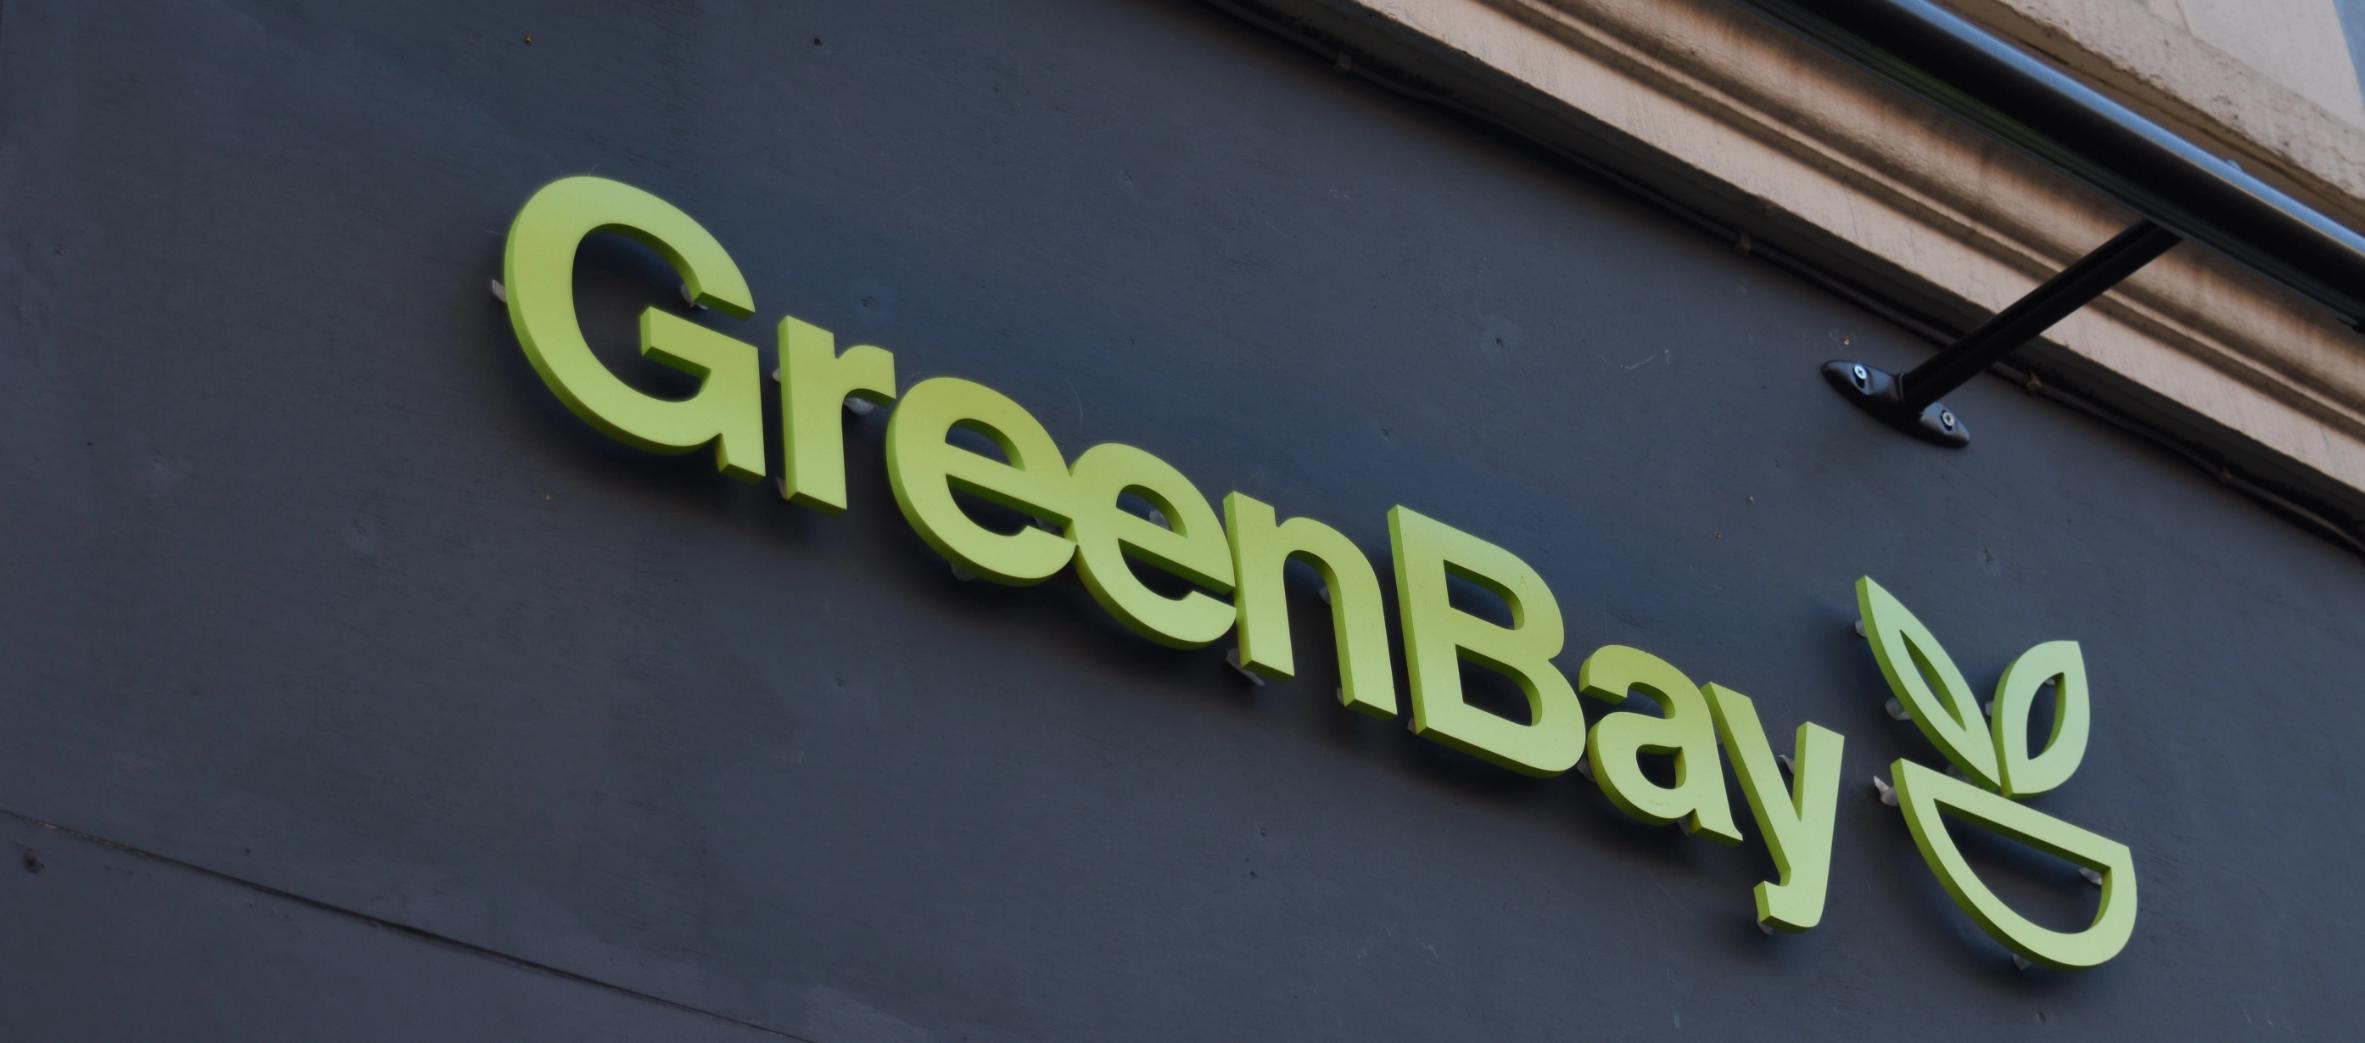 GreenBay Supermarket - London's first vegan grocery store